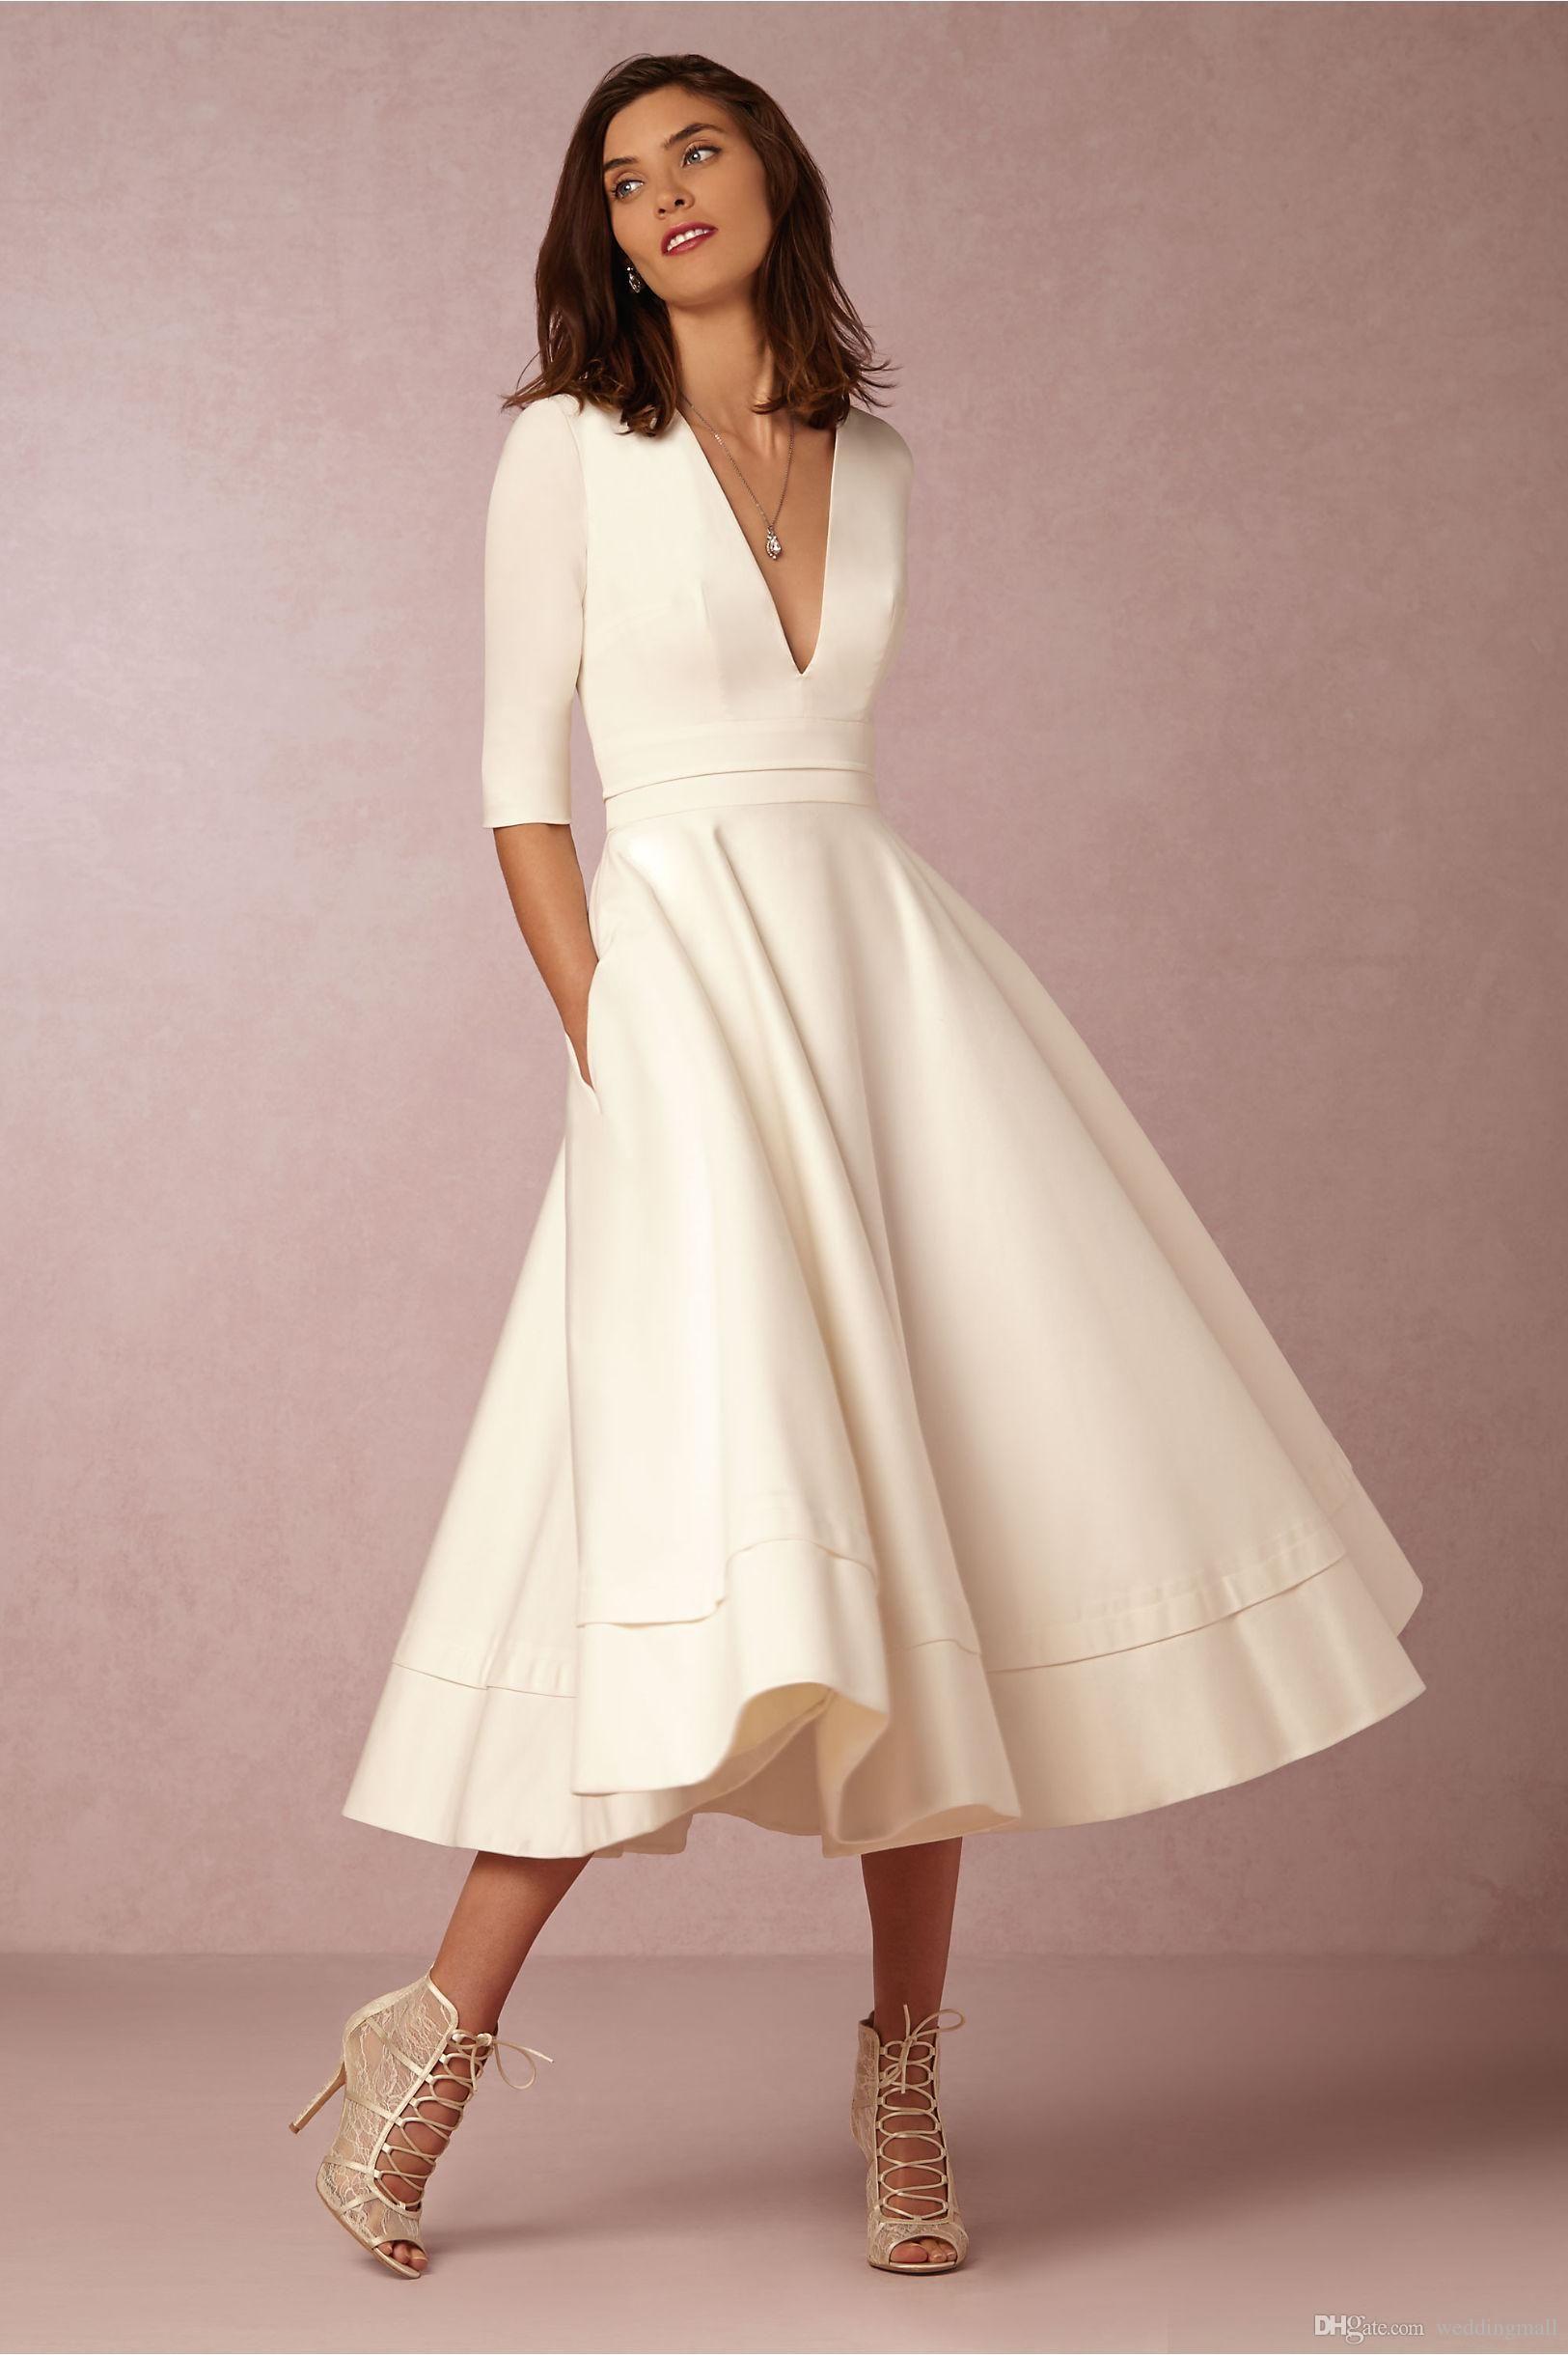 Deep vneck bhdn beach wedding dresses half sleeves aline tea